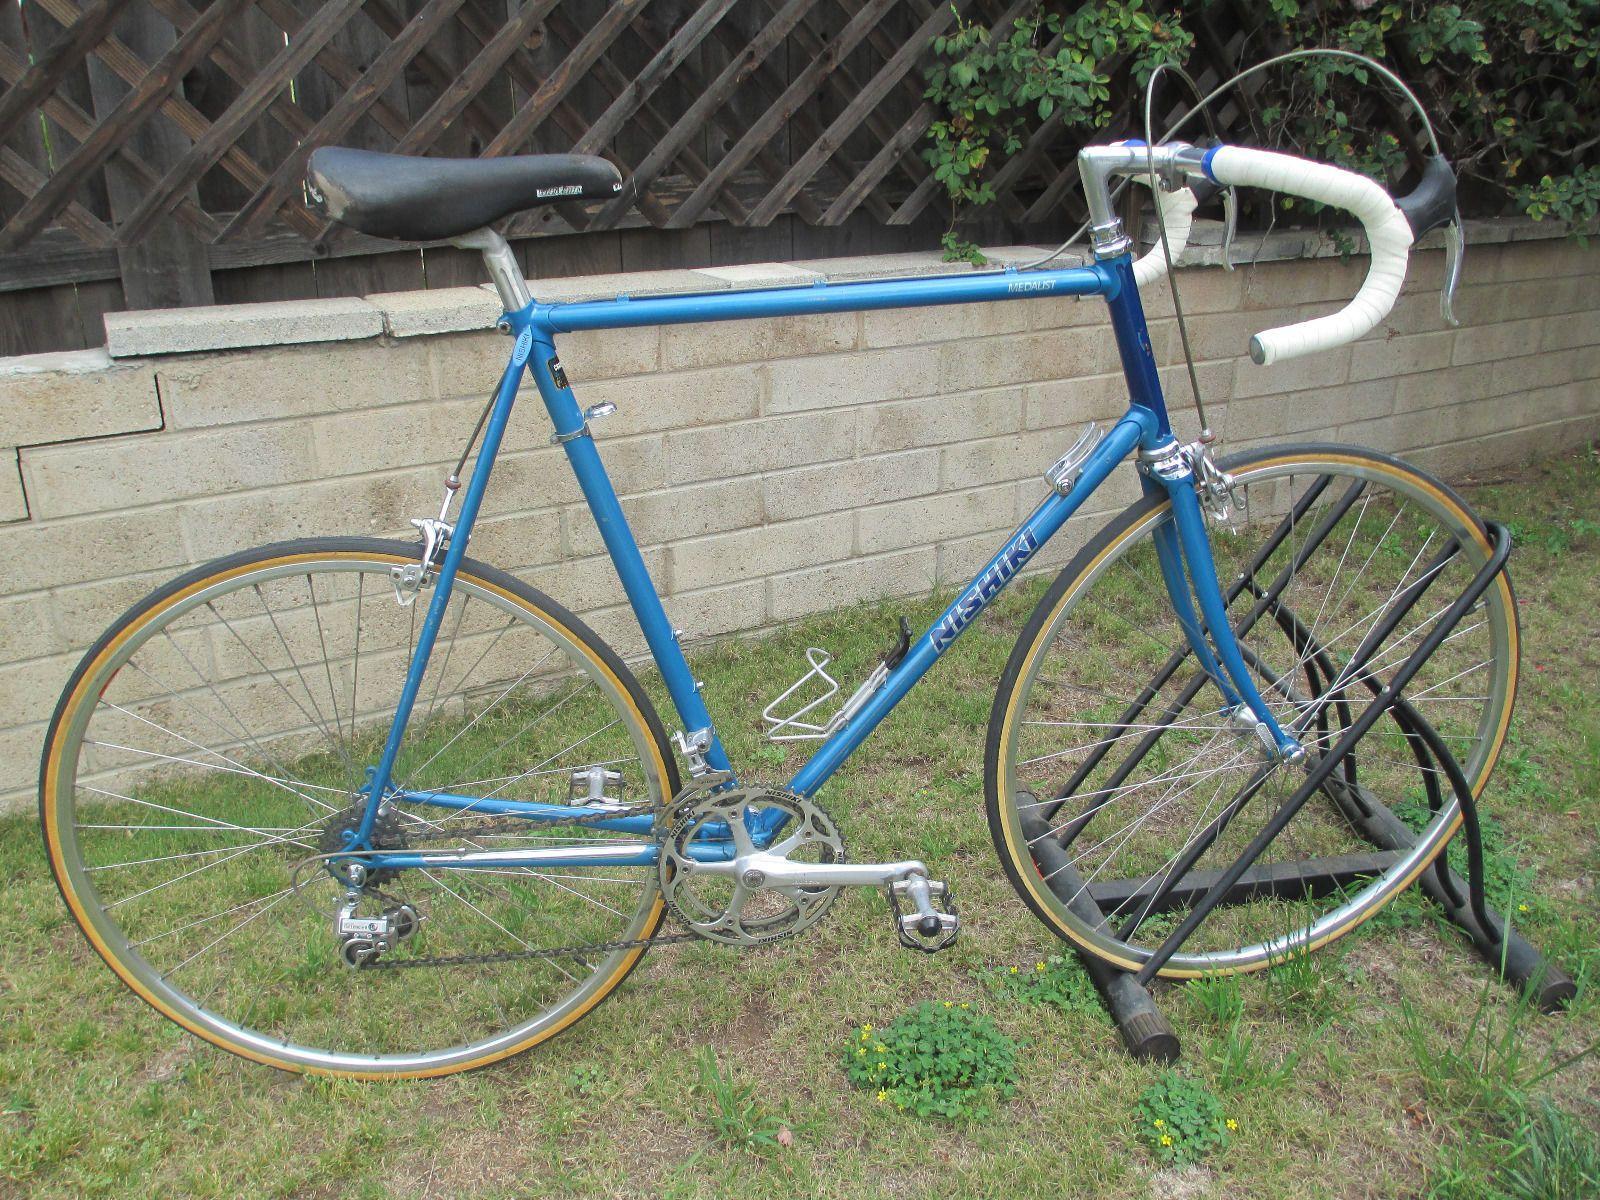 Vintage Rare Nishiki Medalist Road Bike Cycling And Bicycling